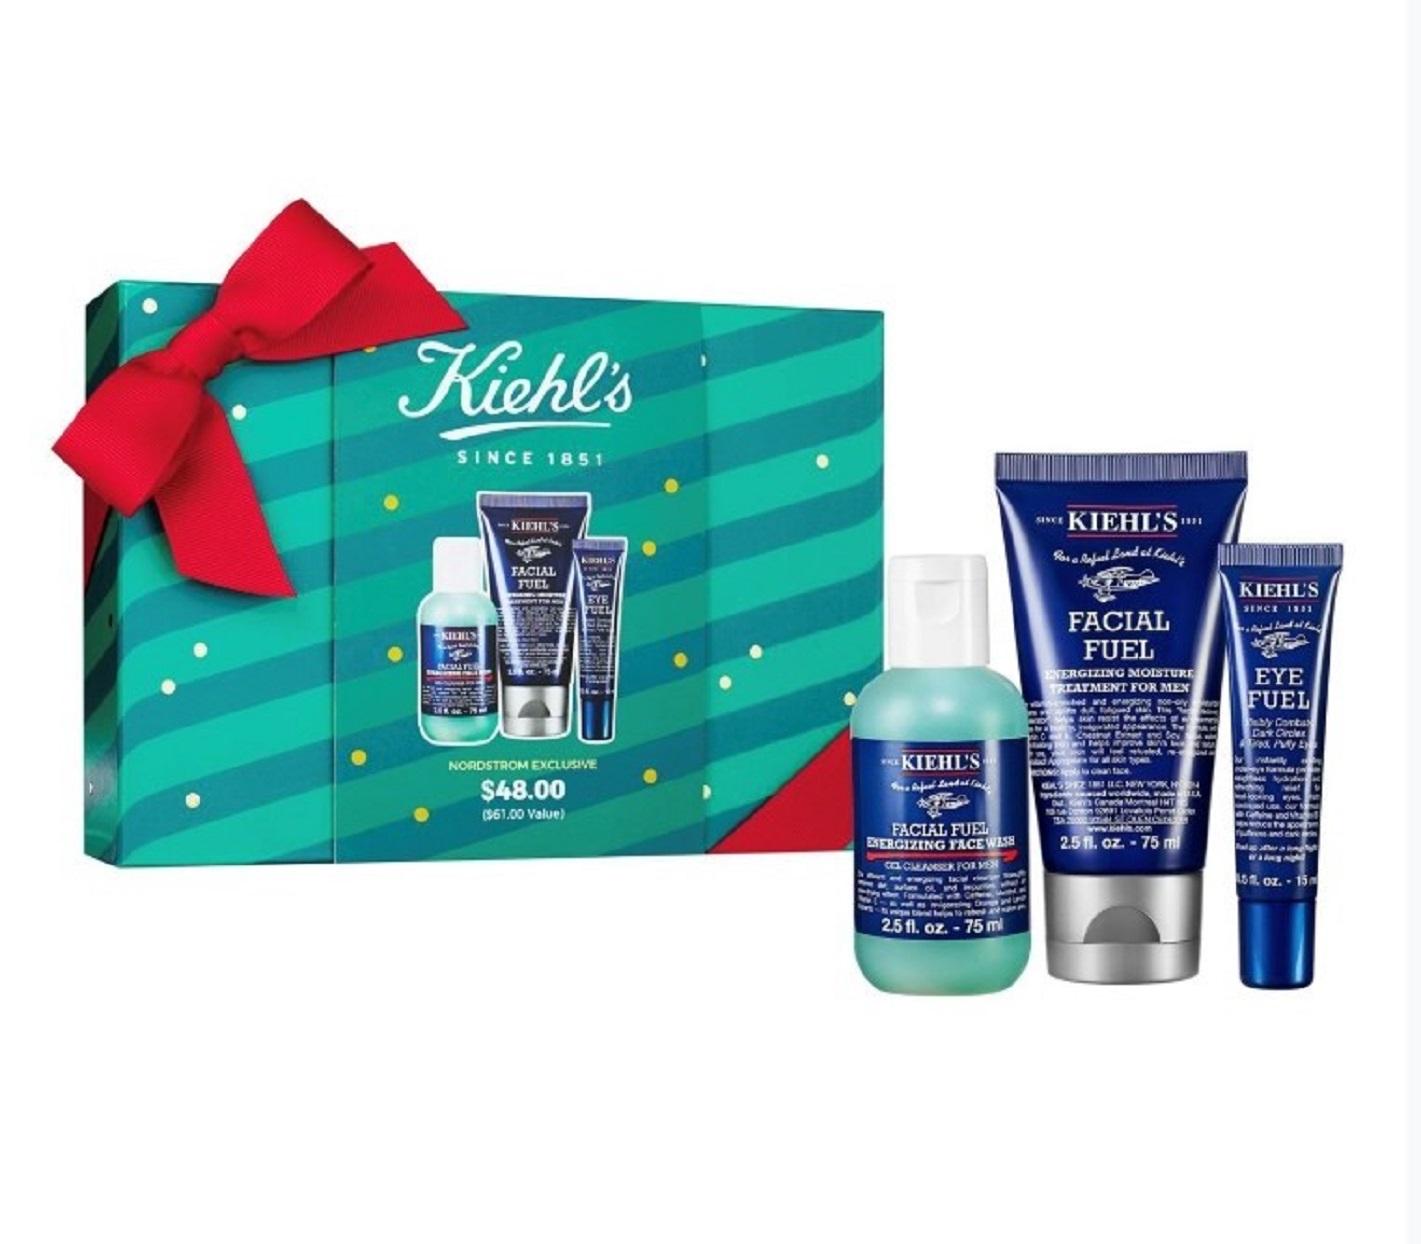 2019 holiday gift guide Kiehl's Facial Fuel Favorites Set for Men